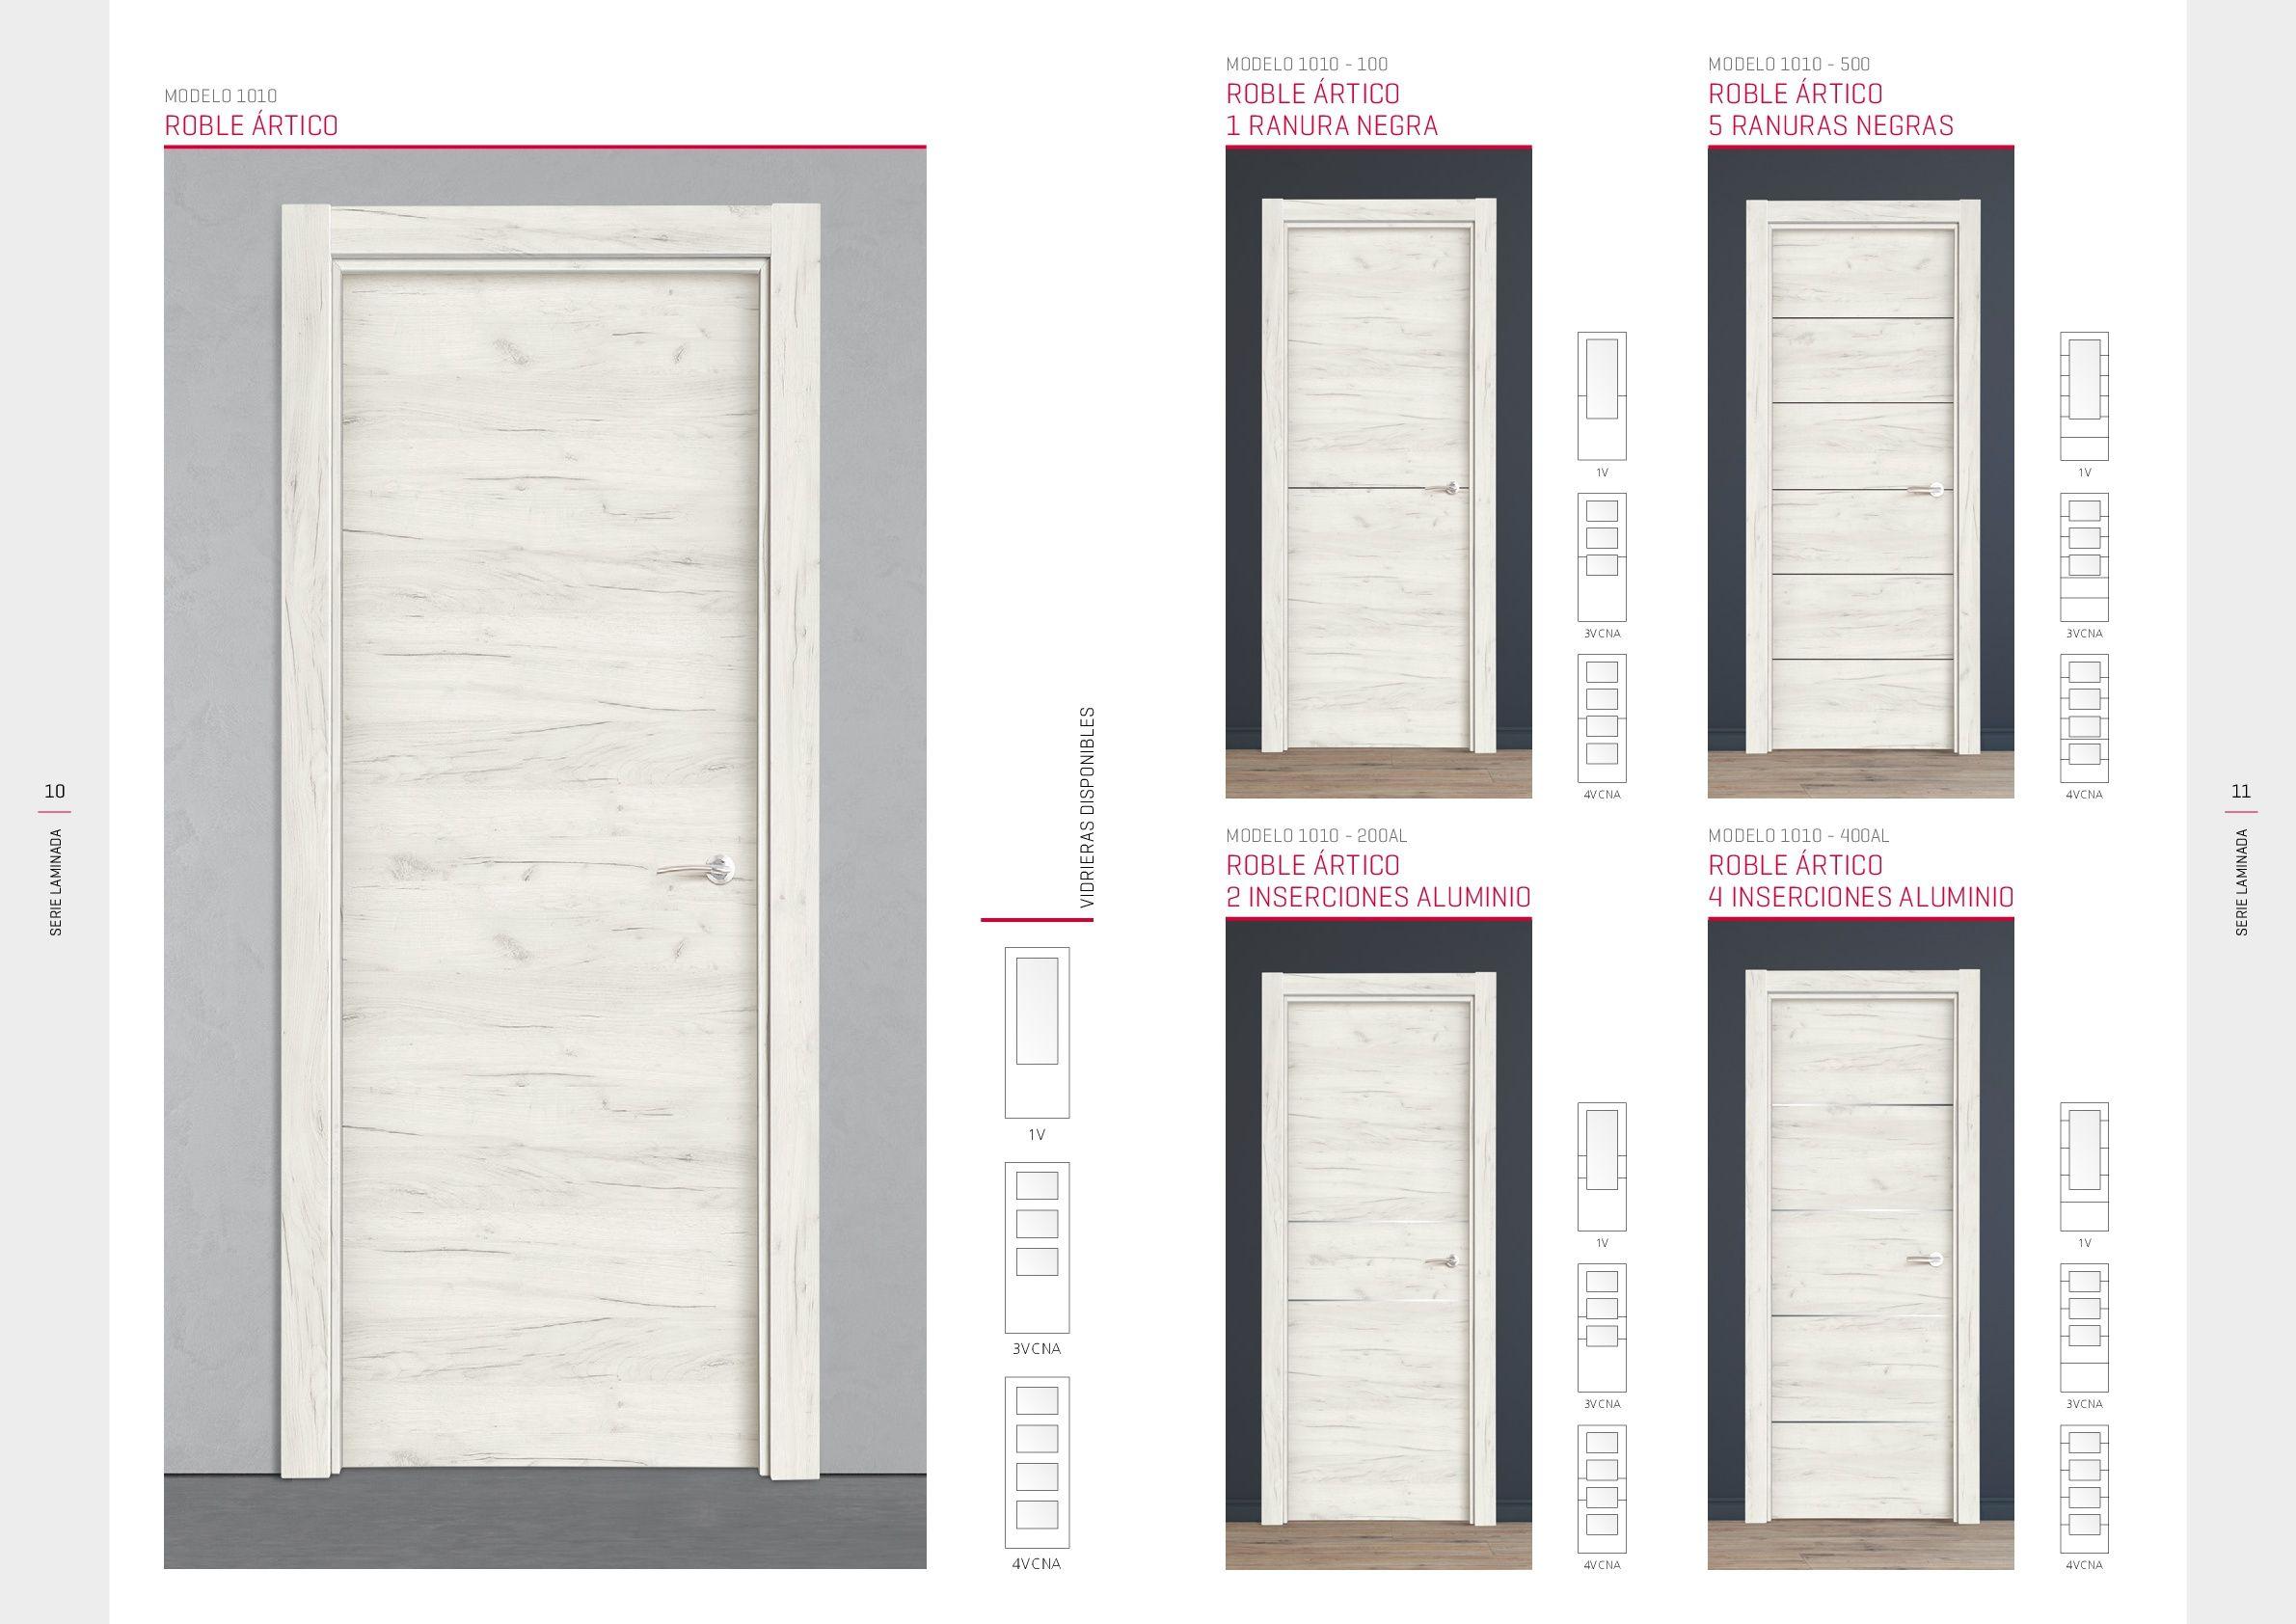 Catálogo - Puertas laminadas - Puertas Carsal | Puertas | Pinterest ...